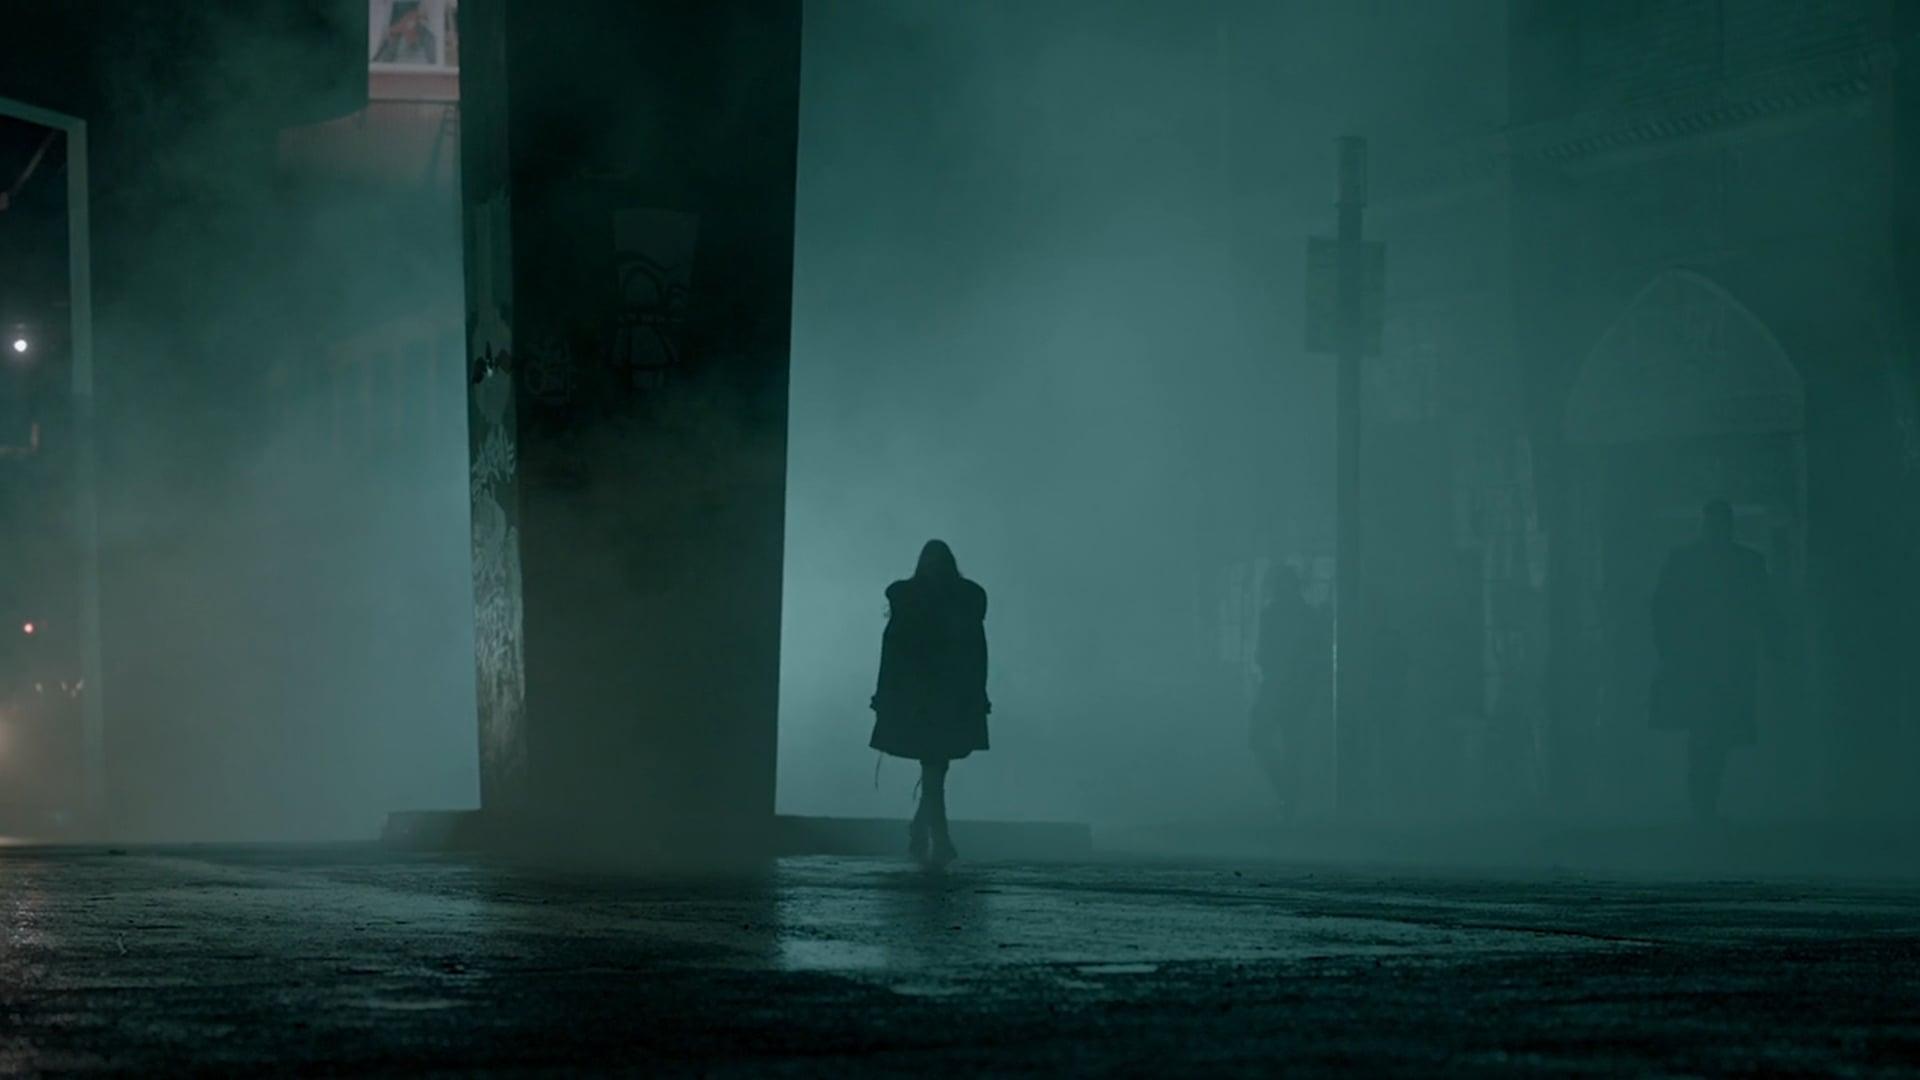 Escape: A Sci-fi short film by Opera Trailer